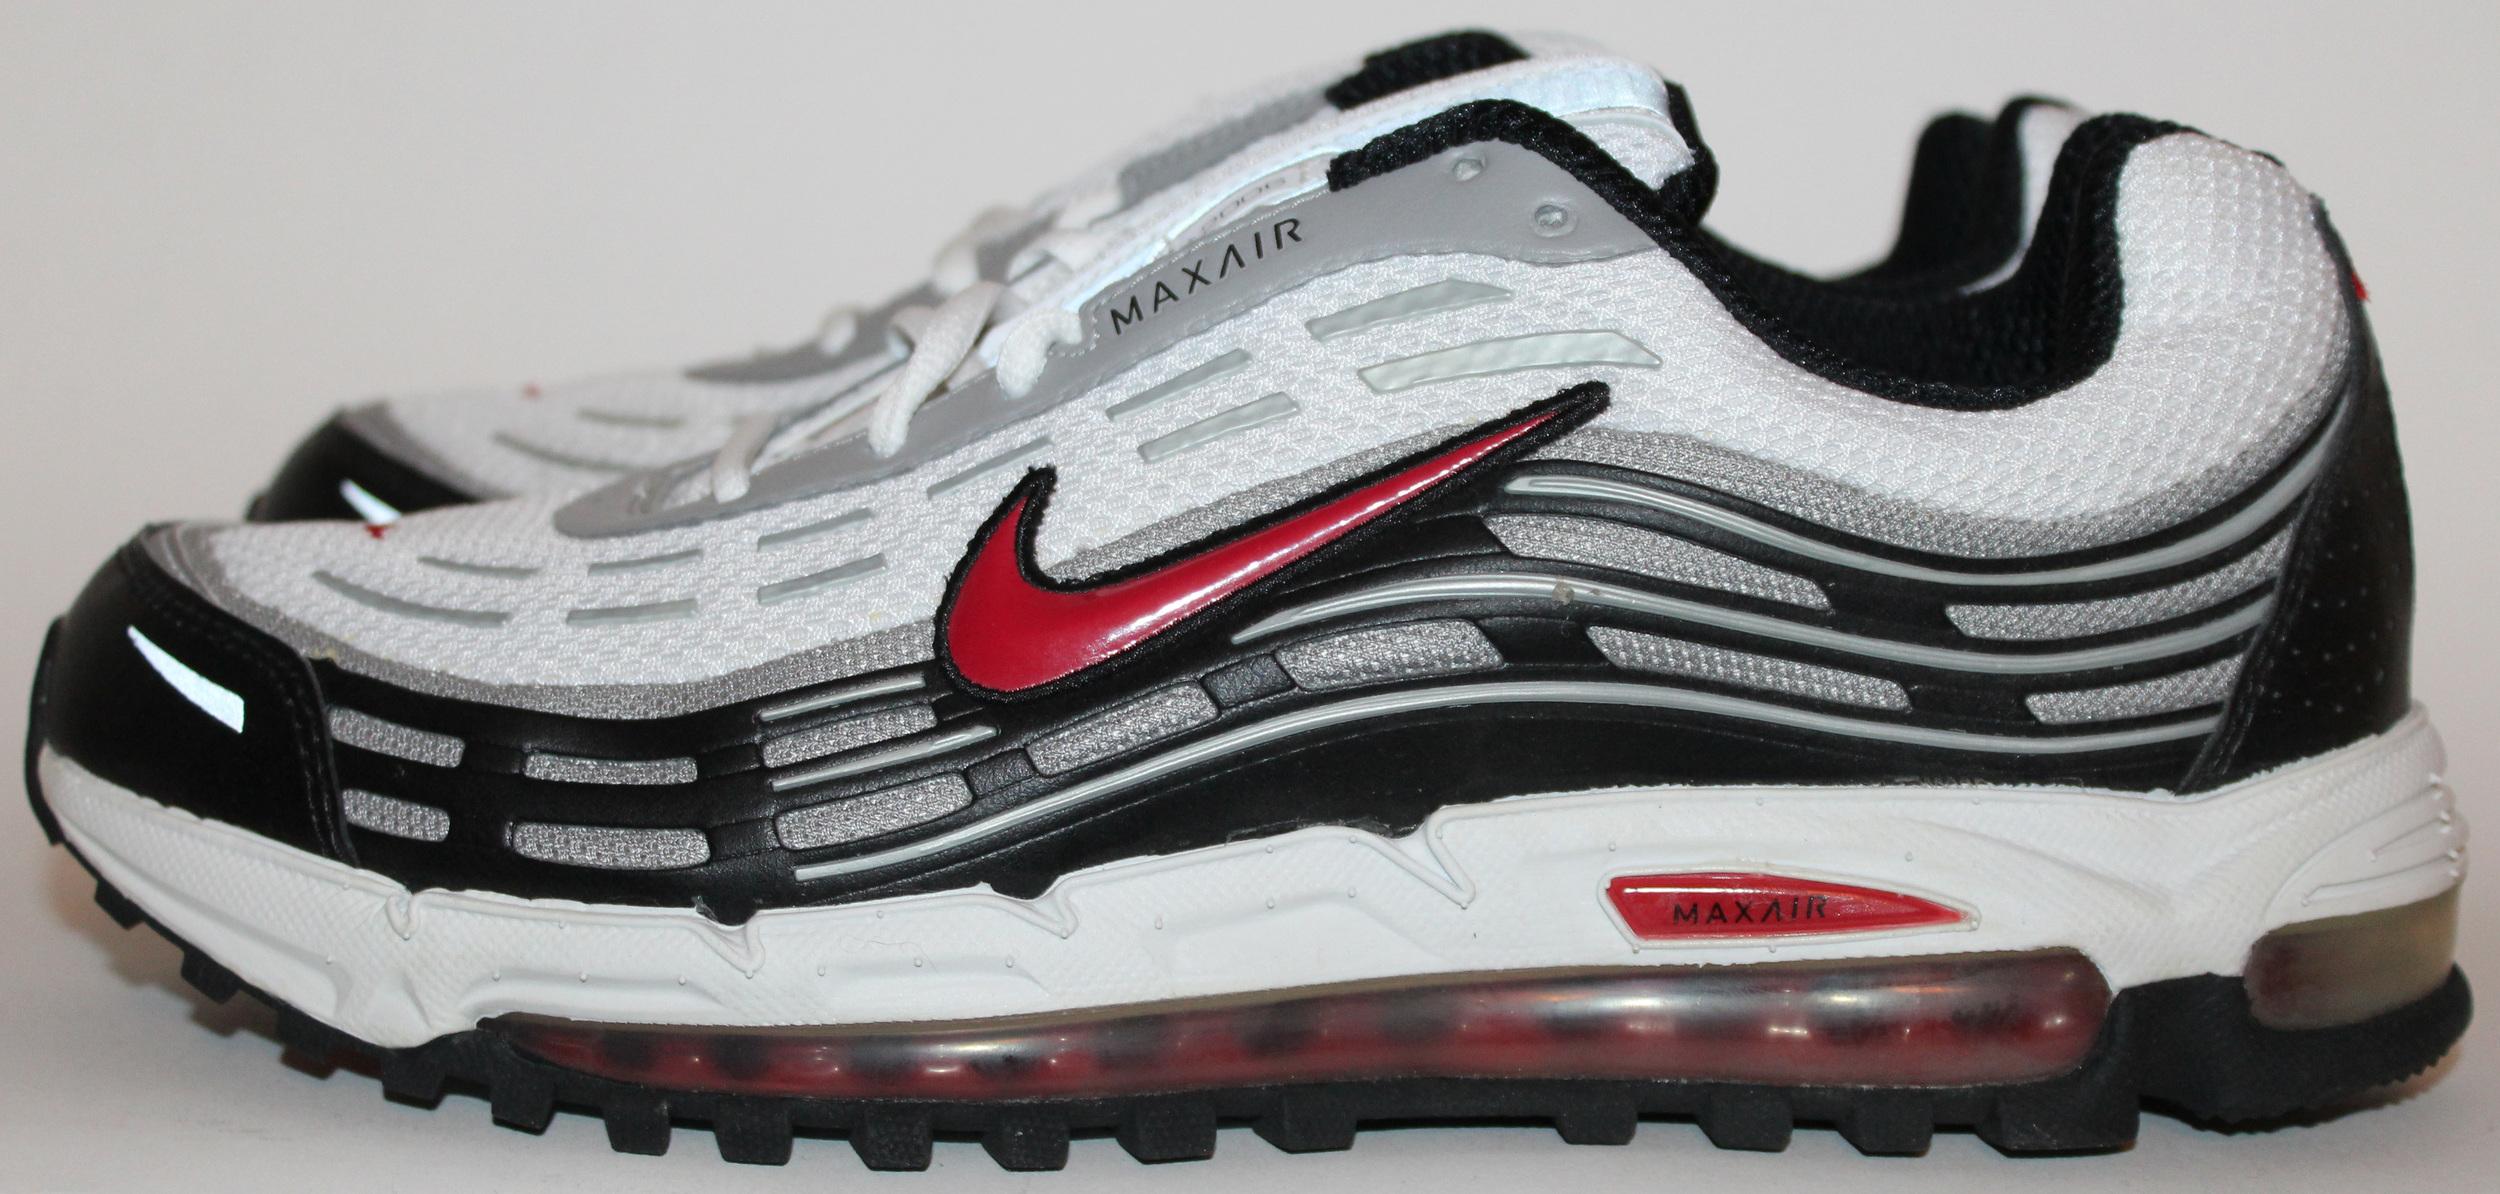 nike air max tn mens shoes red gray 2005 acura